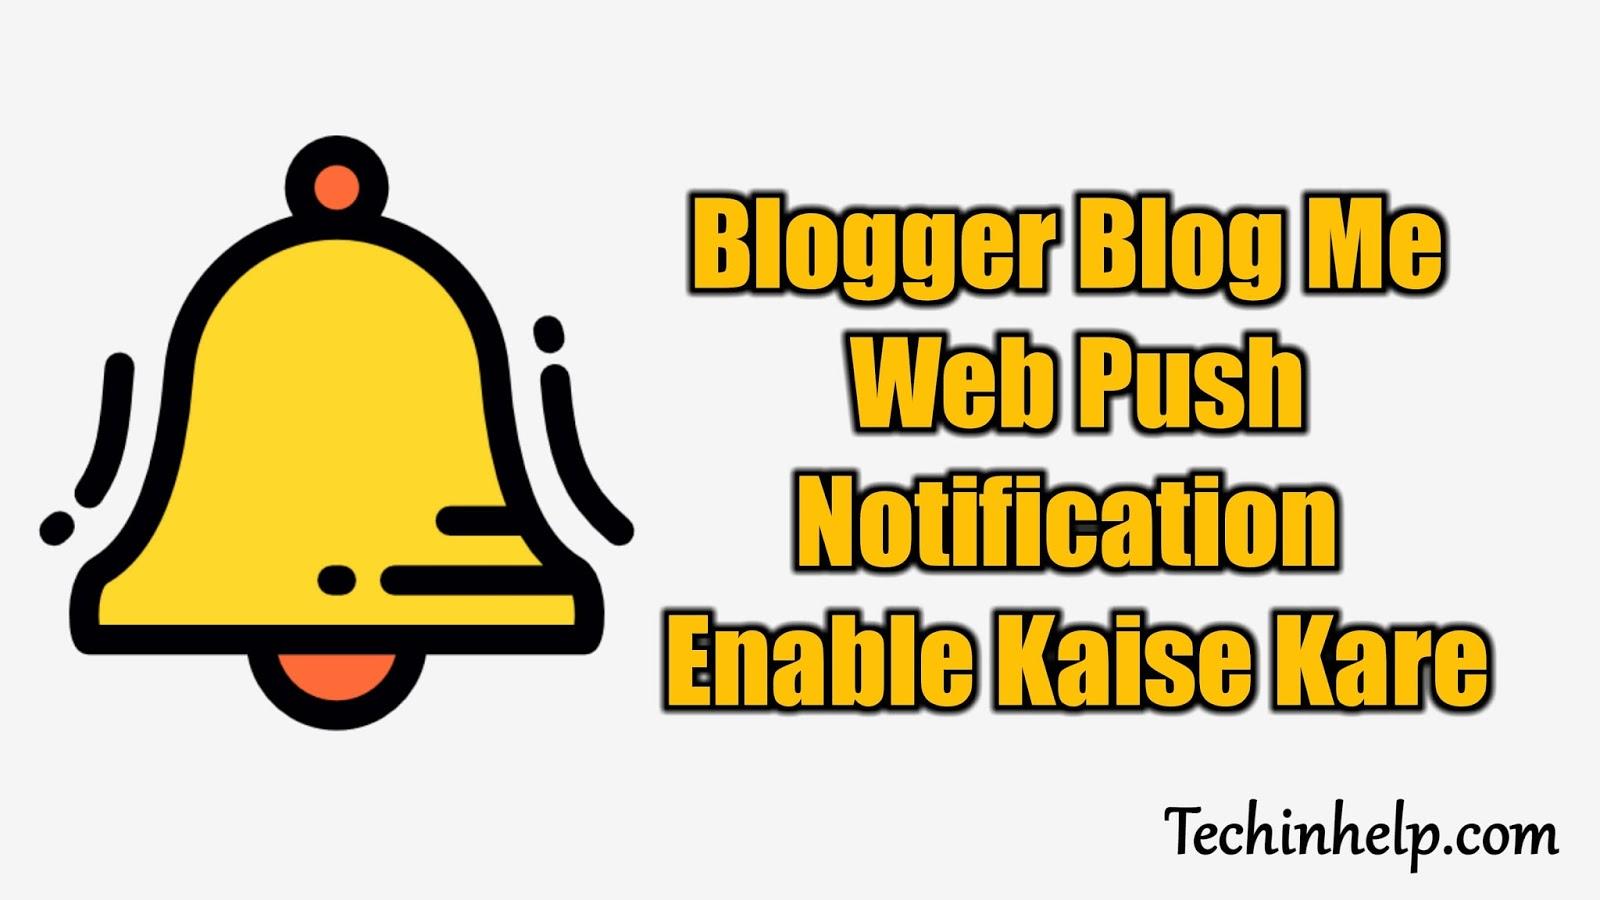 Blogger Blog Me Web Push Notification Enable Kaise Kare